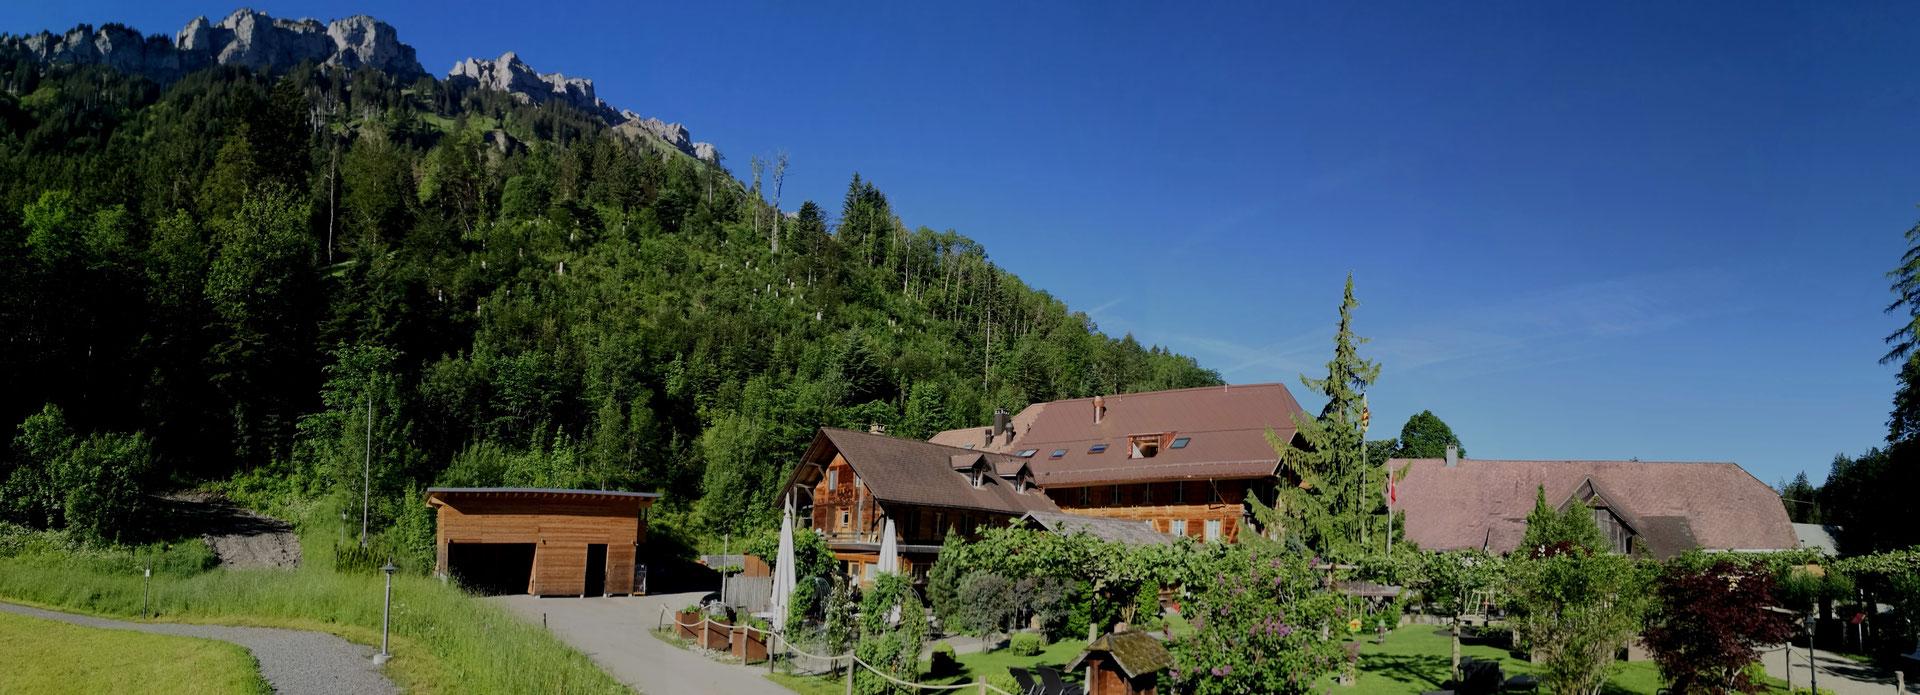 (c) Seminarhotel-bern.ch